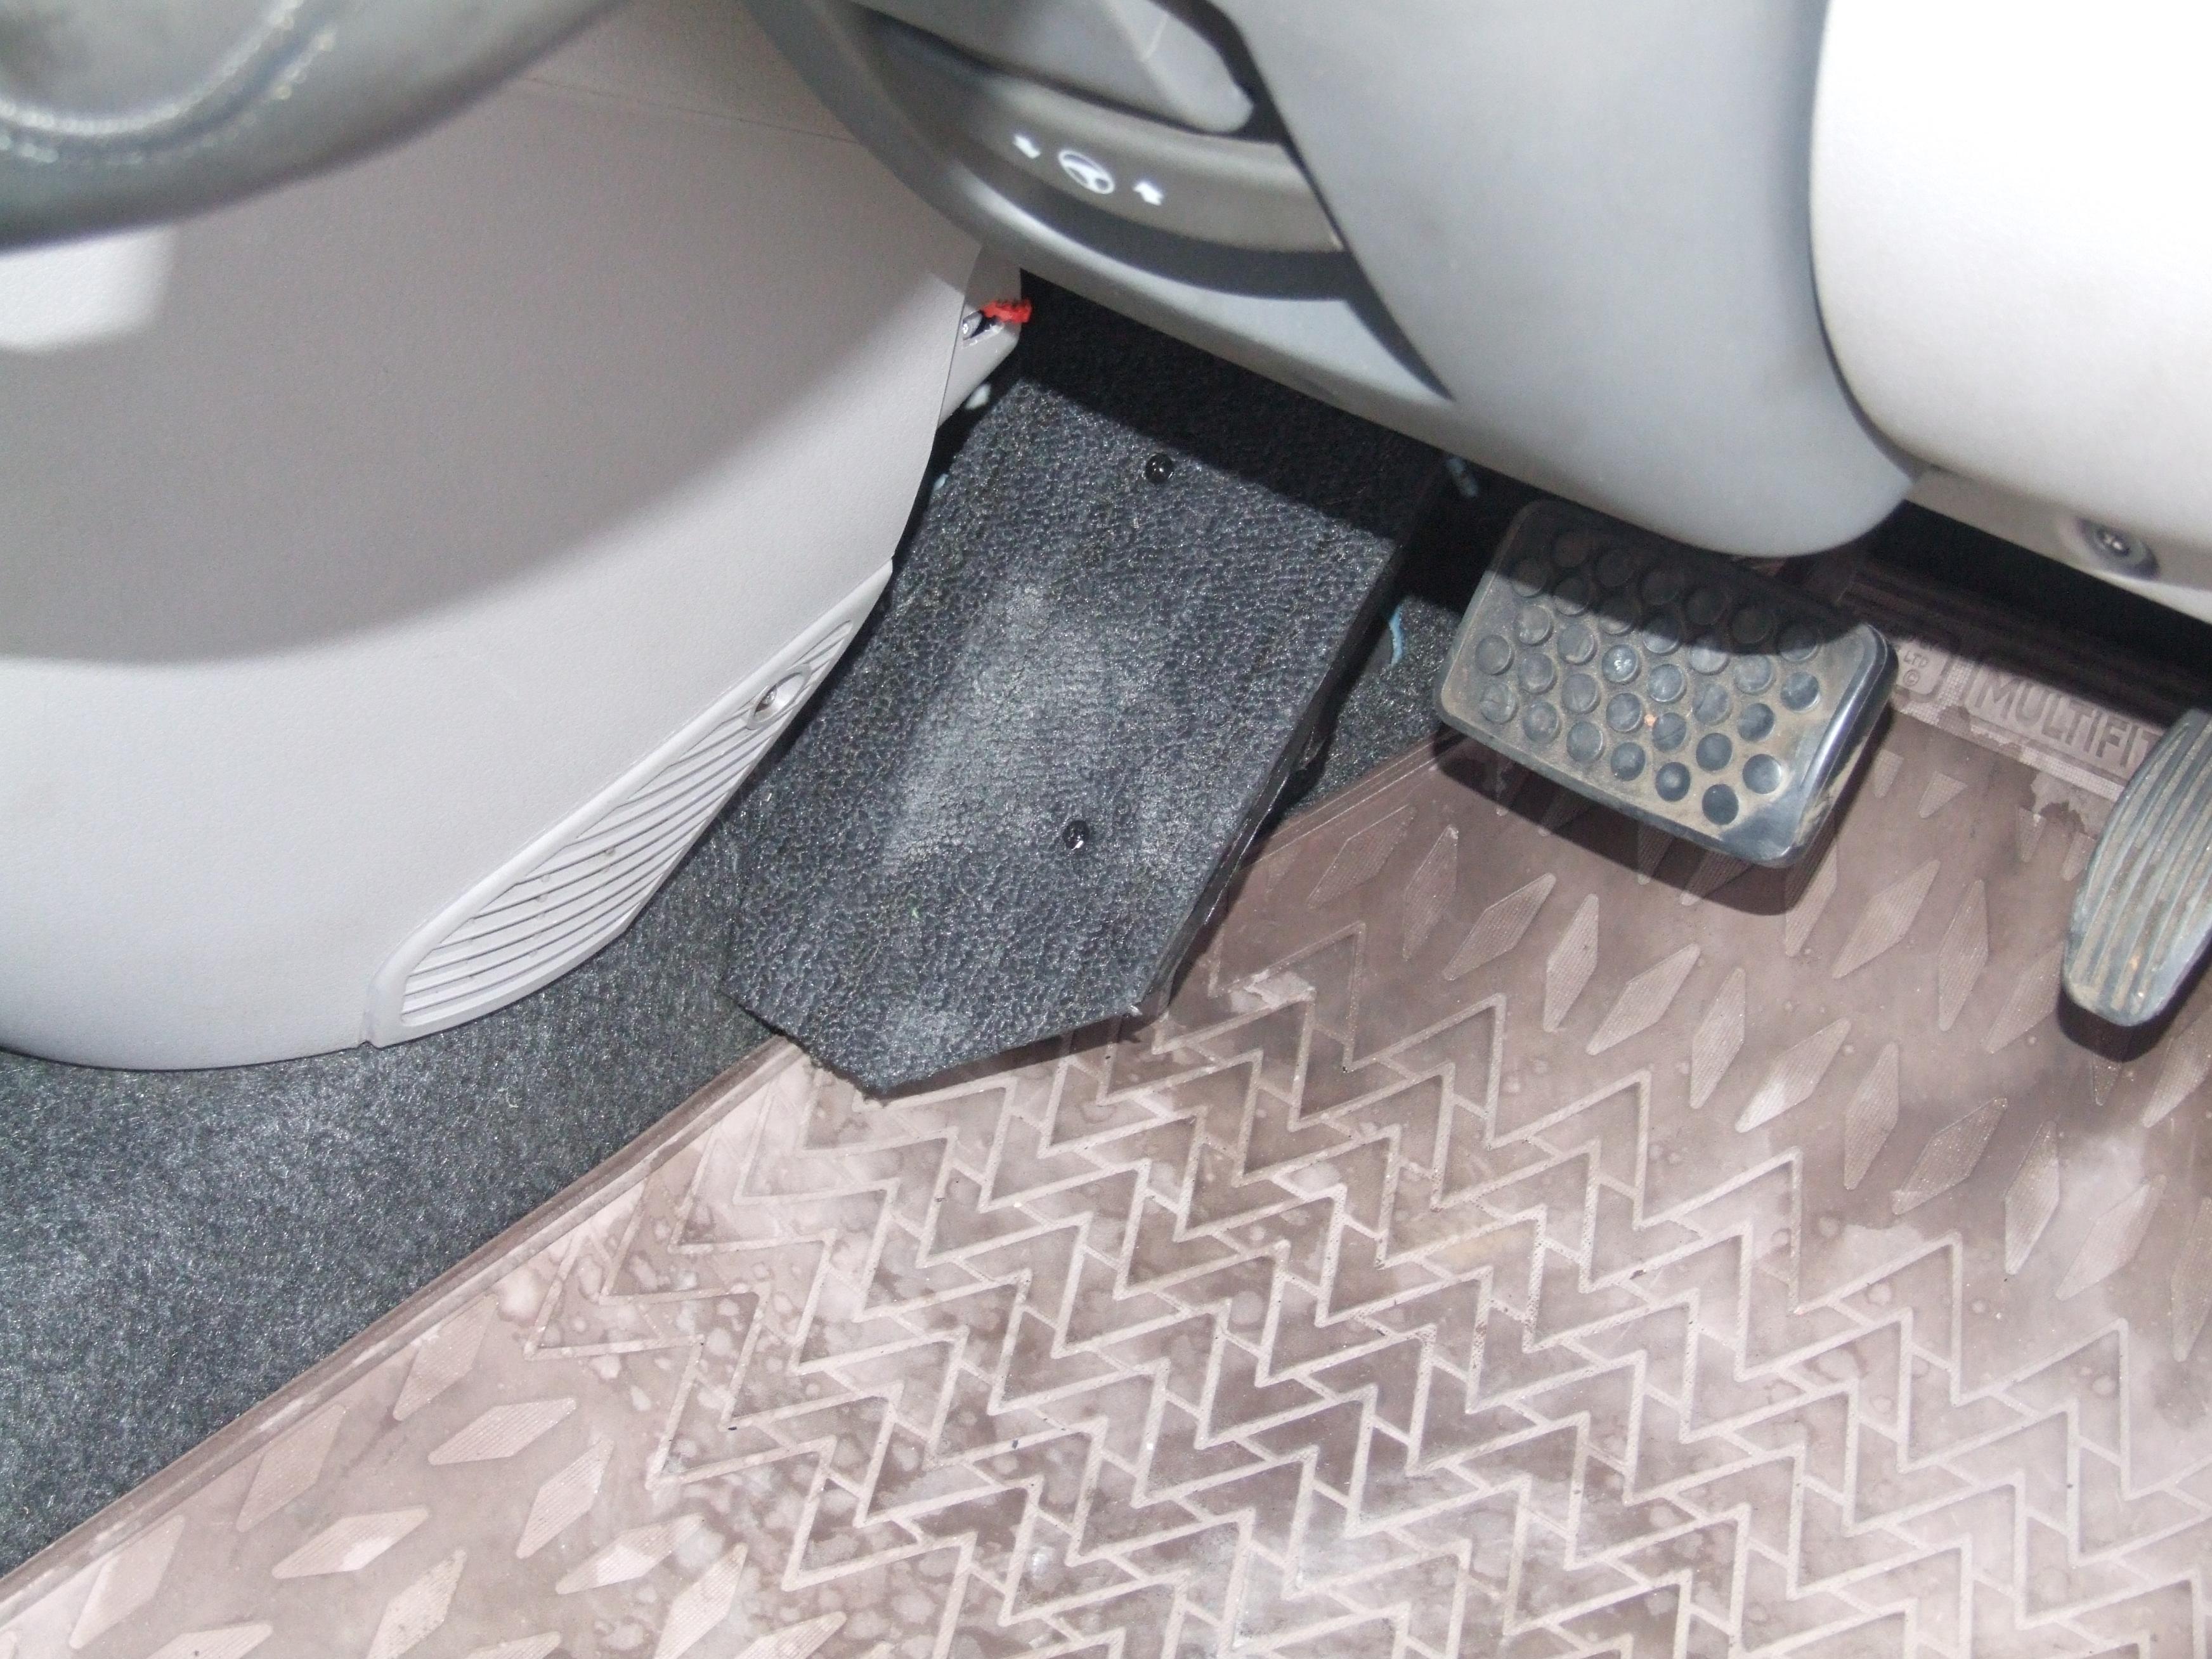 Click image for larger version  Name:Panda footrest carpet (1).JPG Views:4 Size:2.22 MB ID:219793